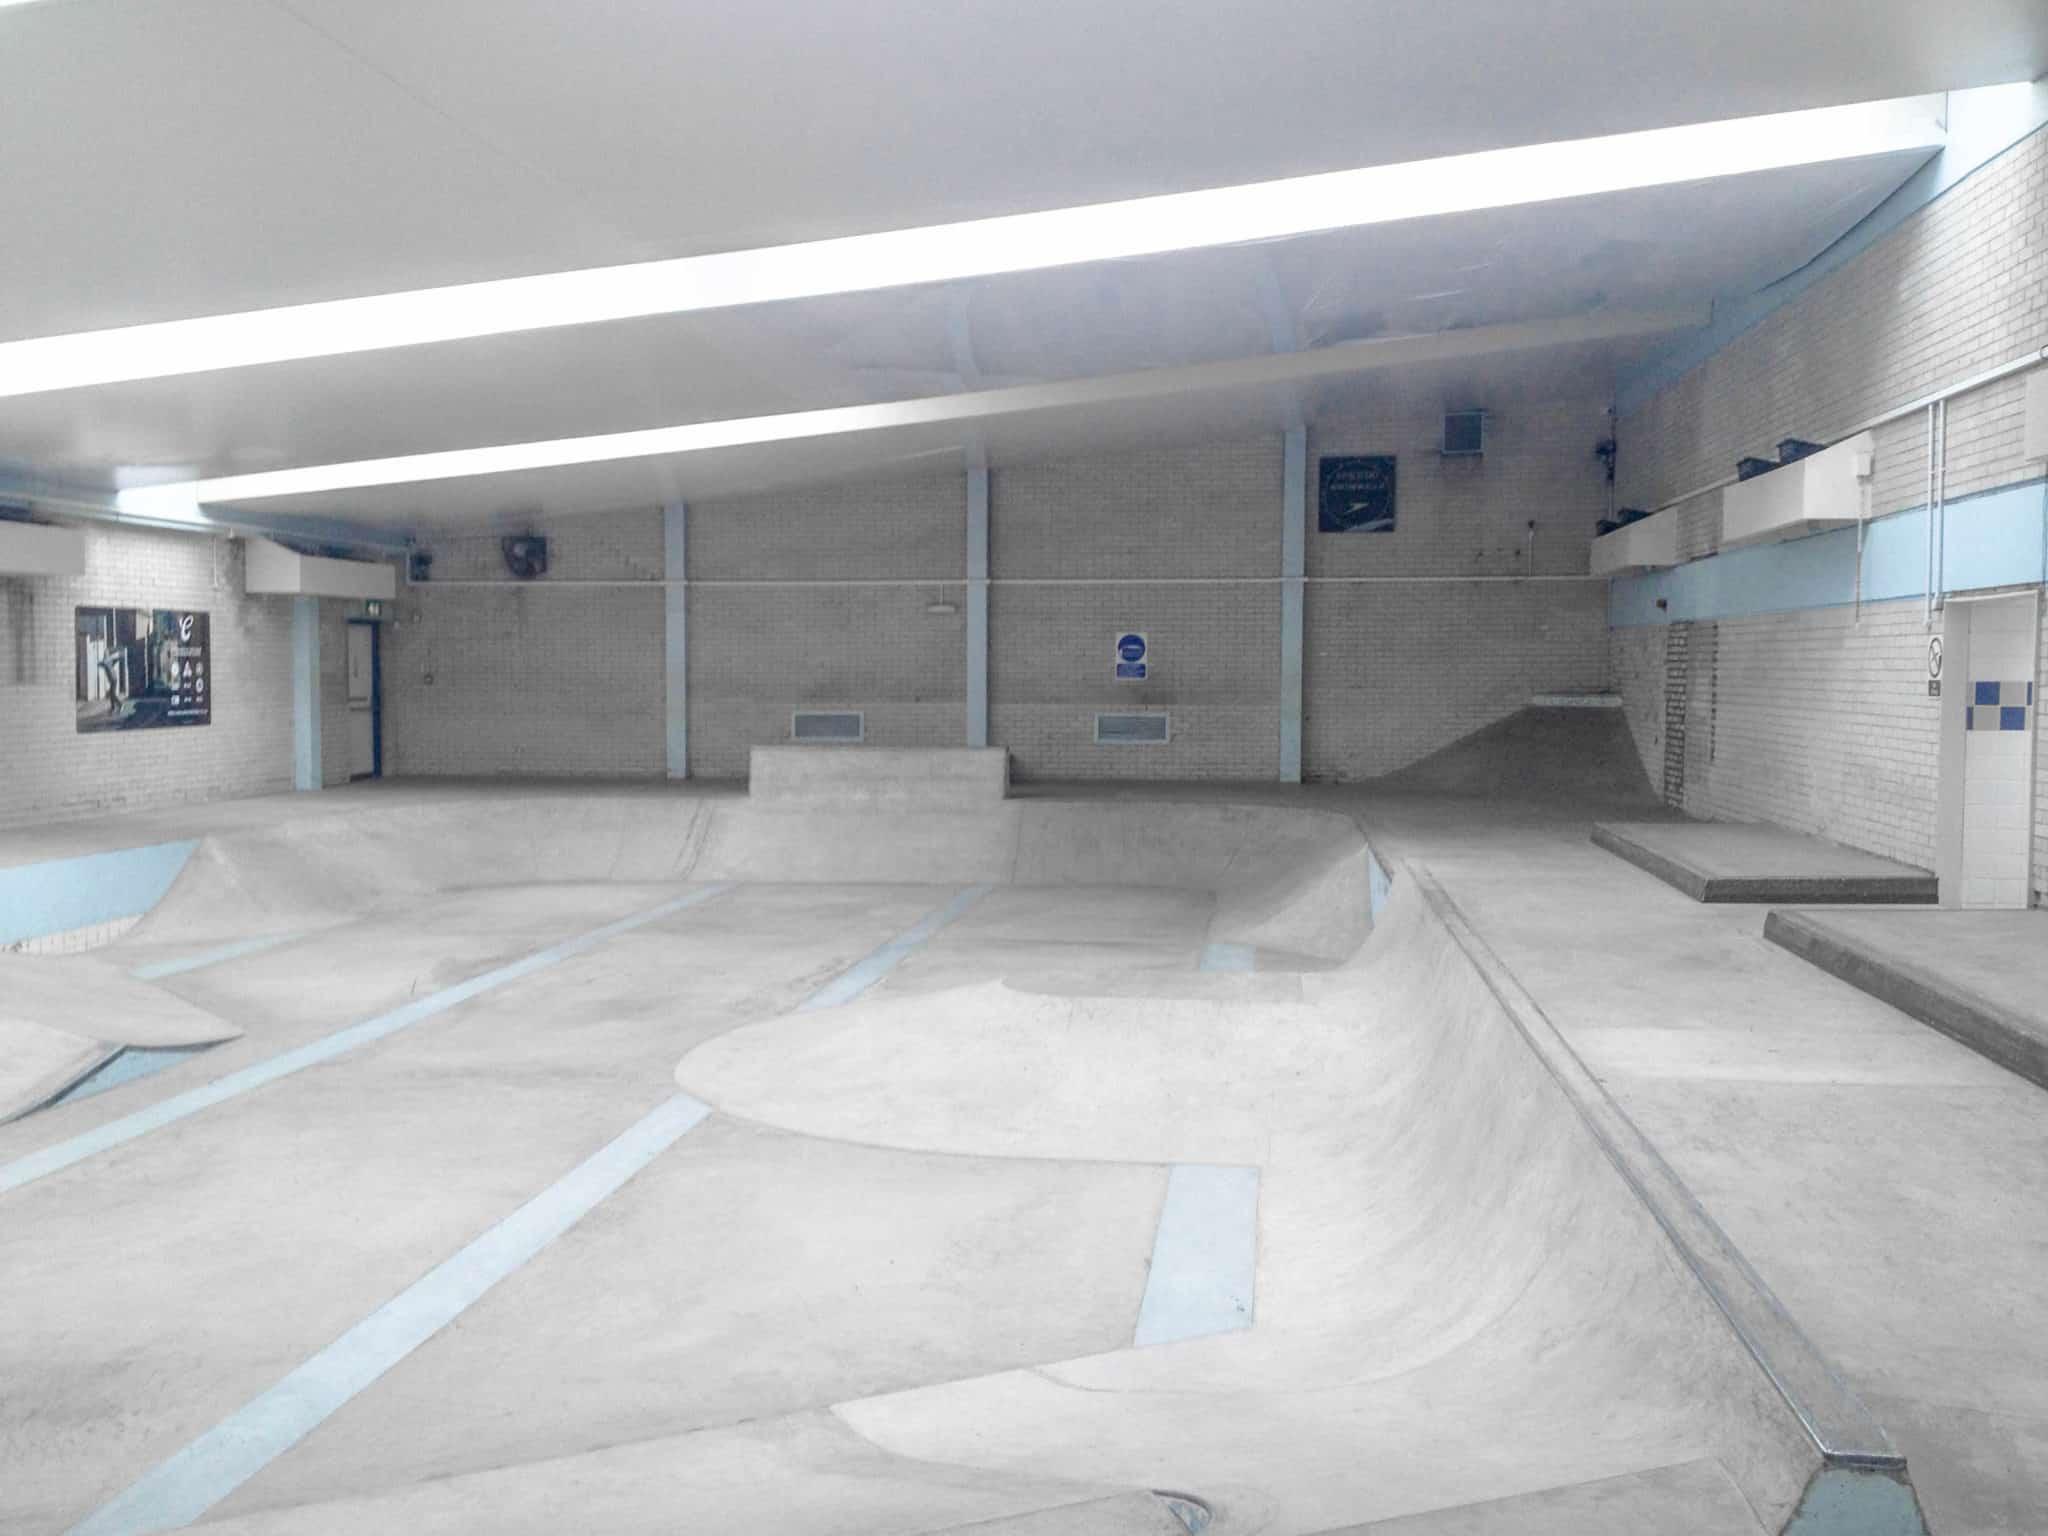 Campus pool skate park emmett russell architects - University of bristol swimming pool ...